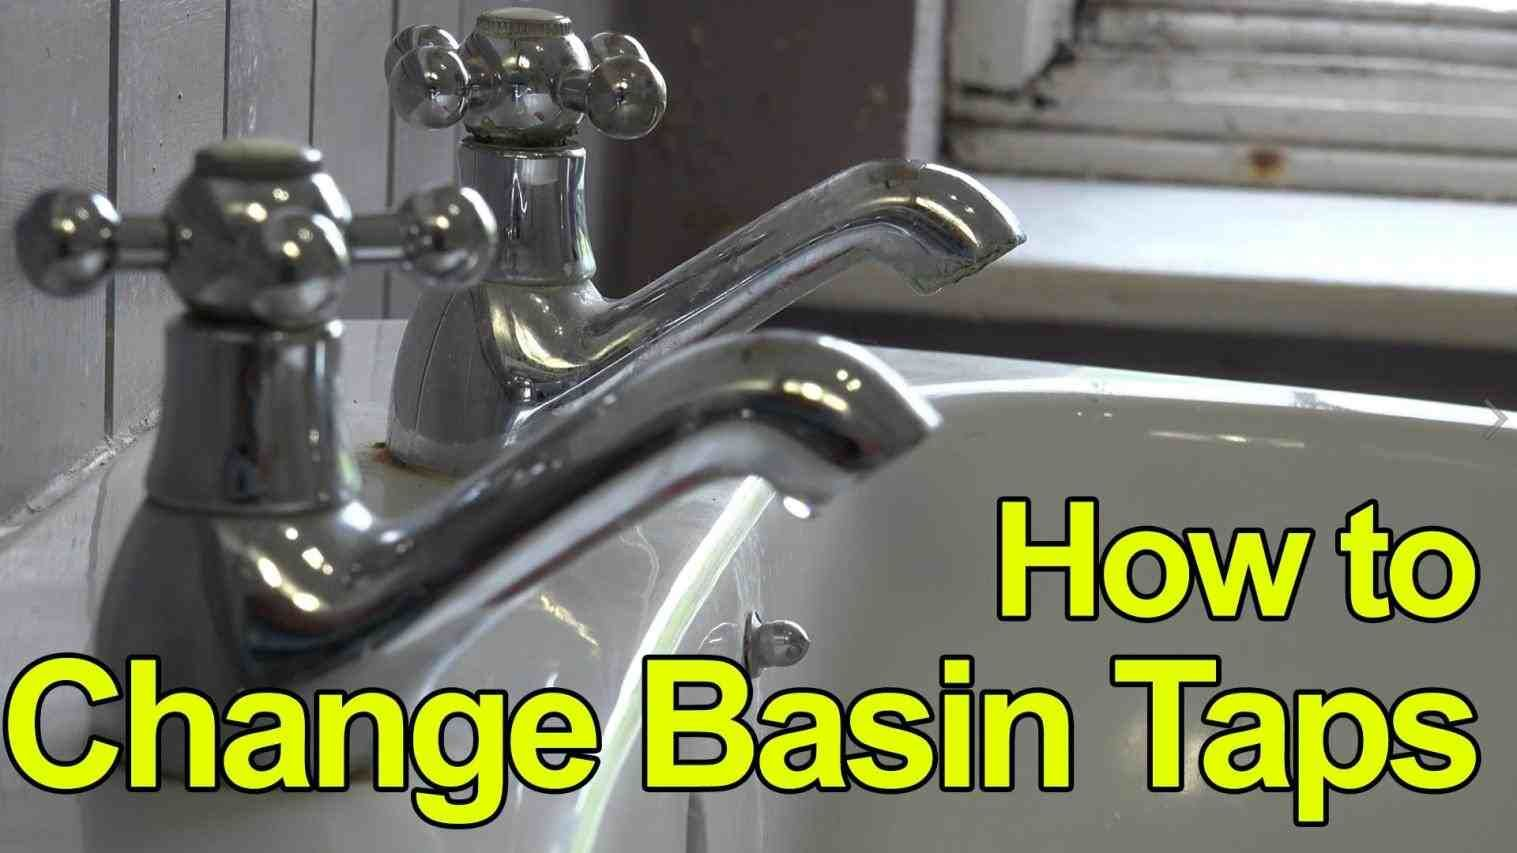 New Post replacement lever tap handles visit bathroomremodelideass ...